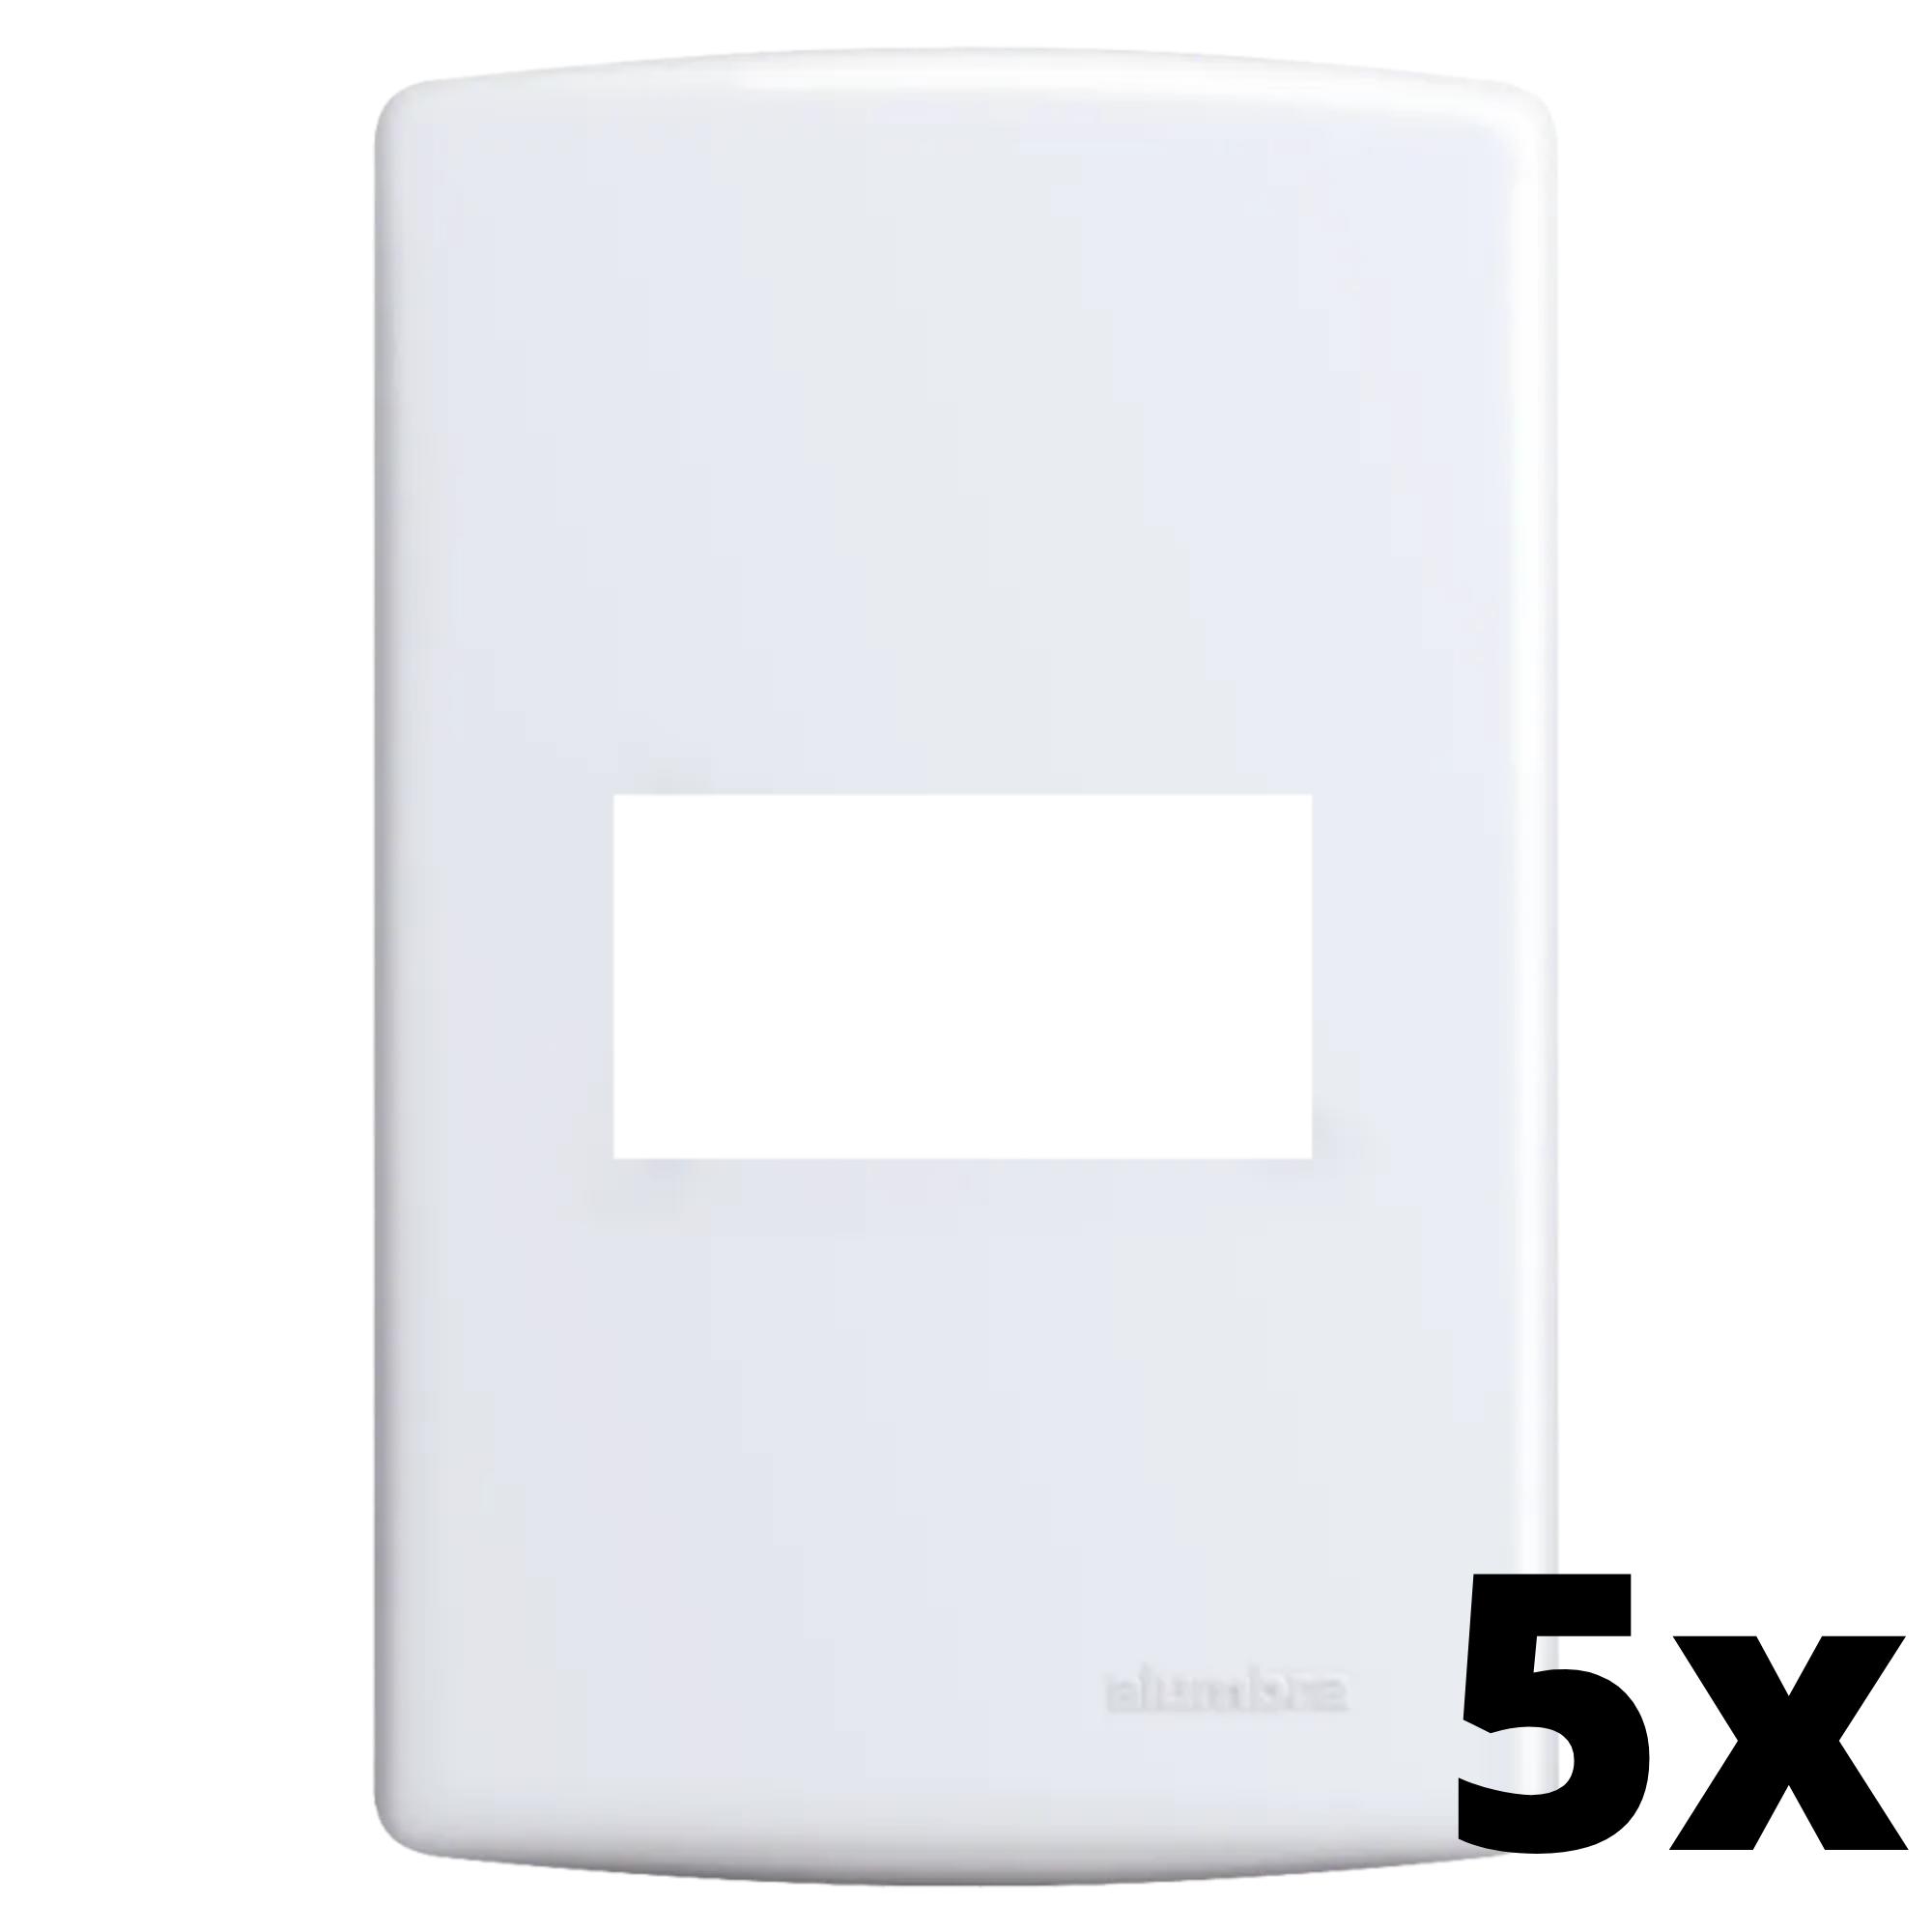 Kit 5 und Siena Placa 4x2 Cega